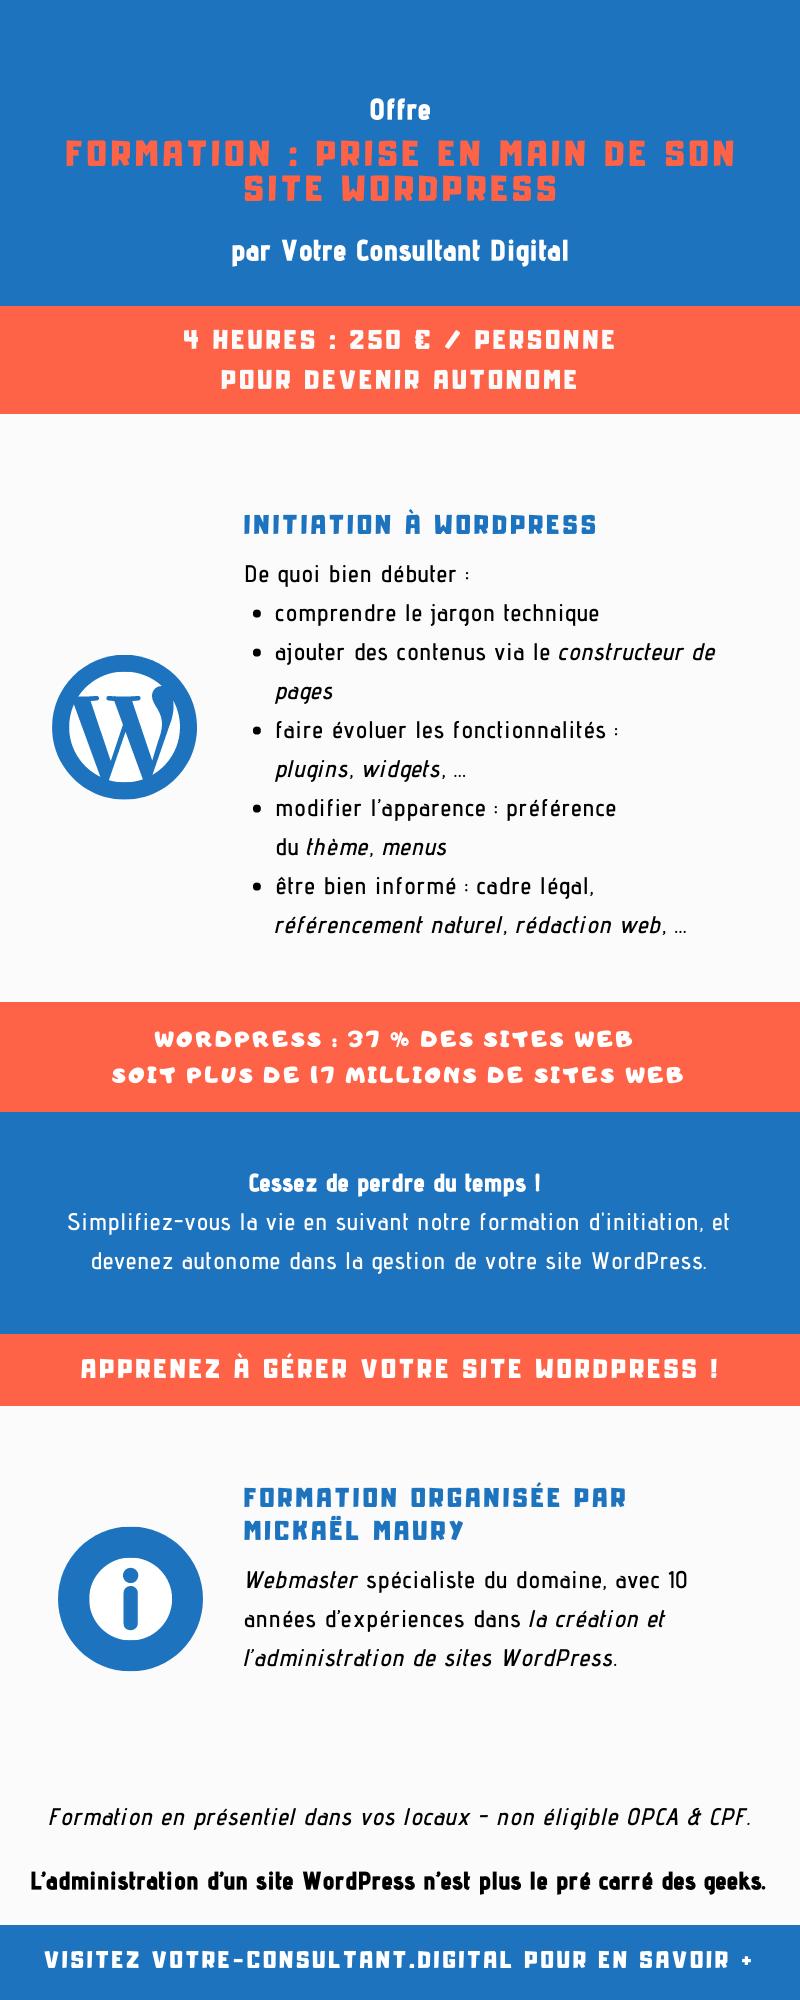 Formation : prise en main de son site WordPress